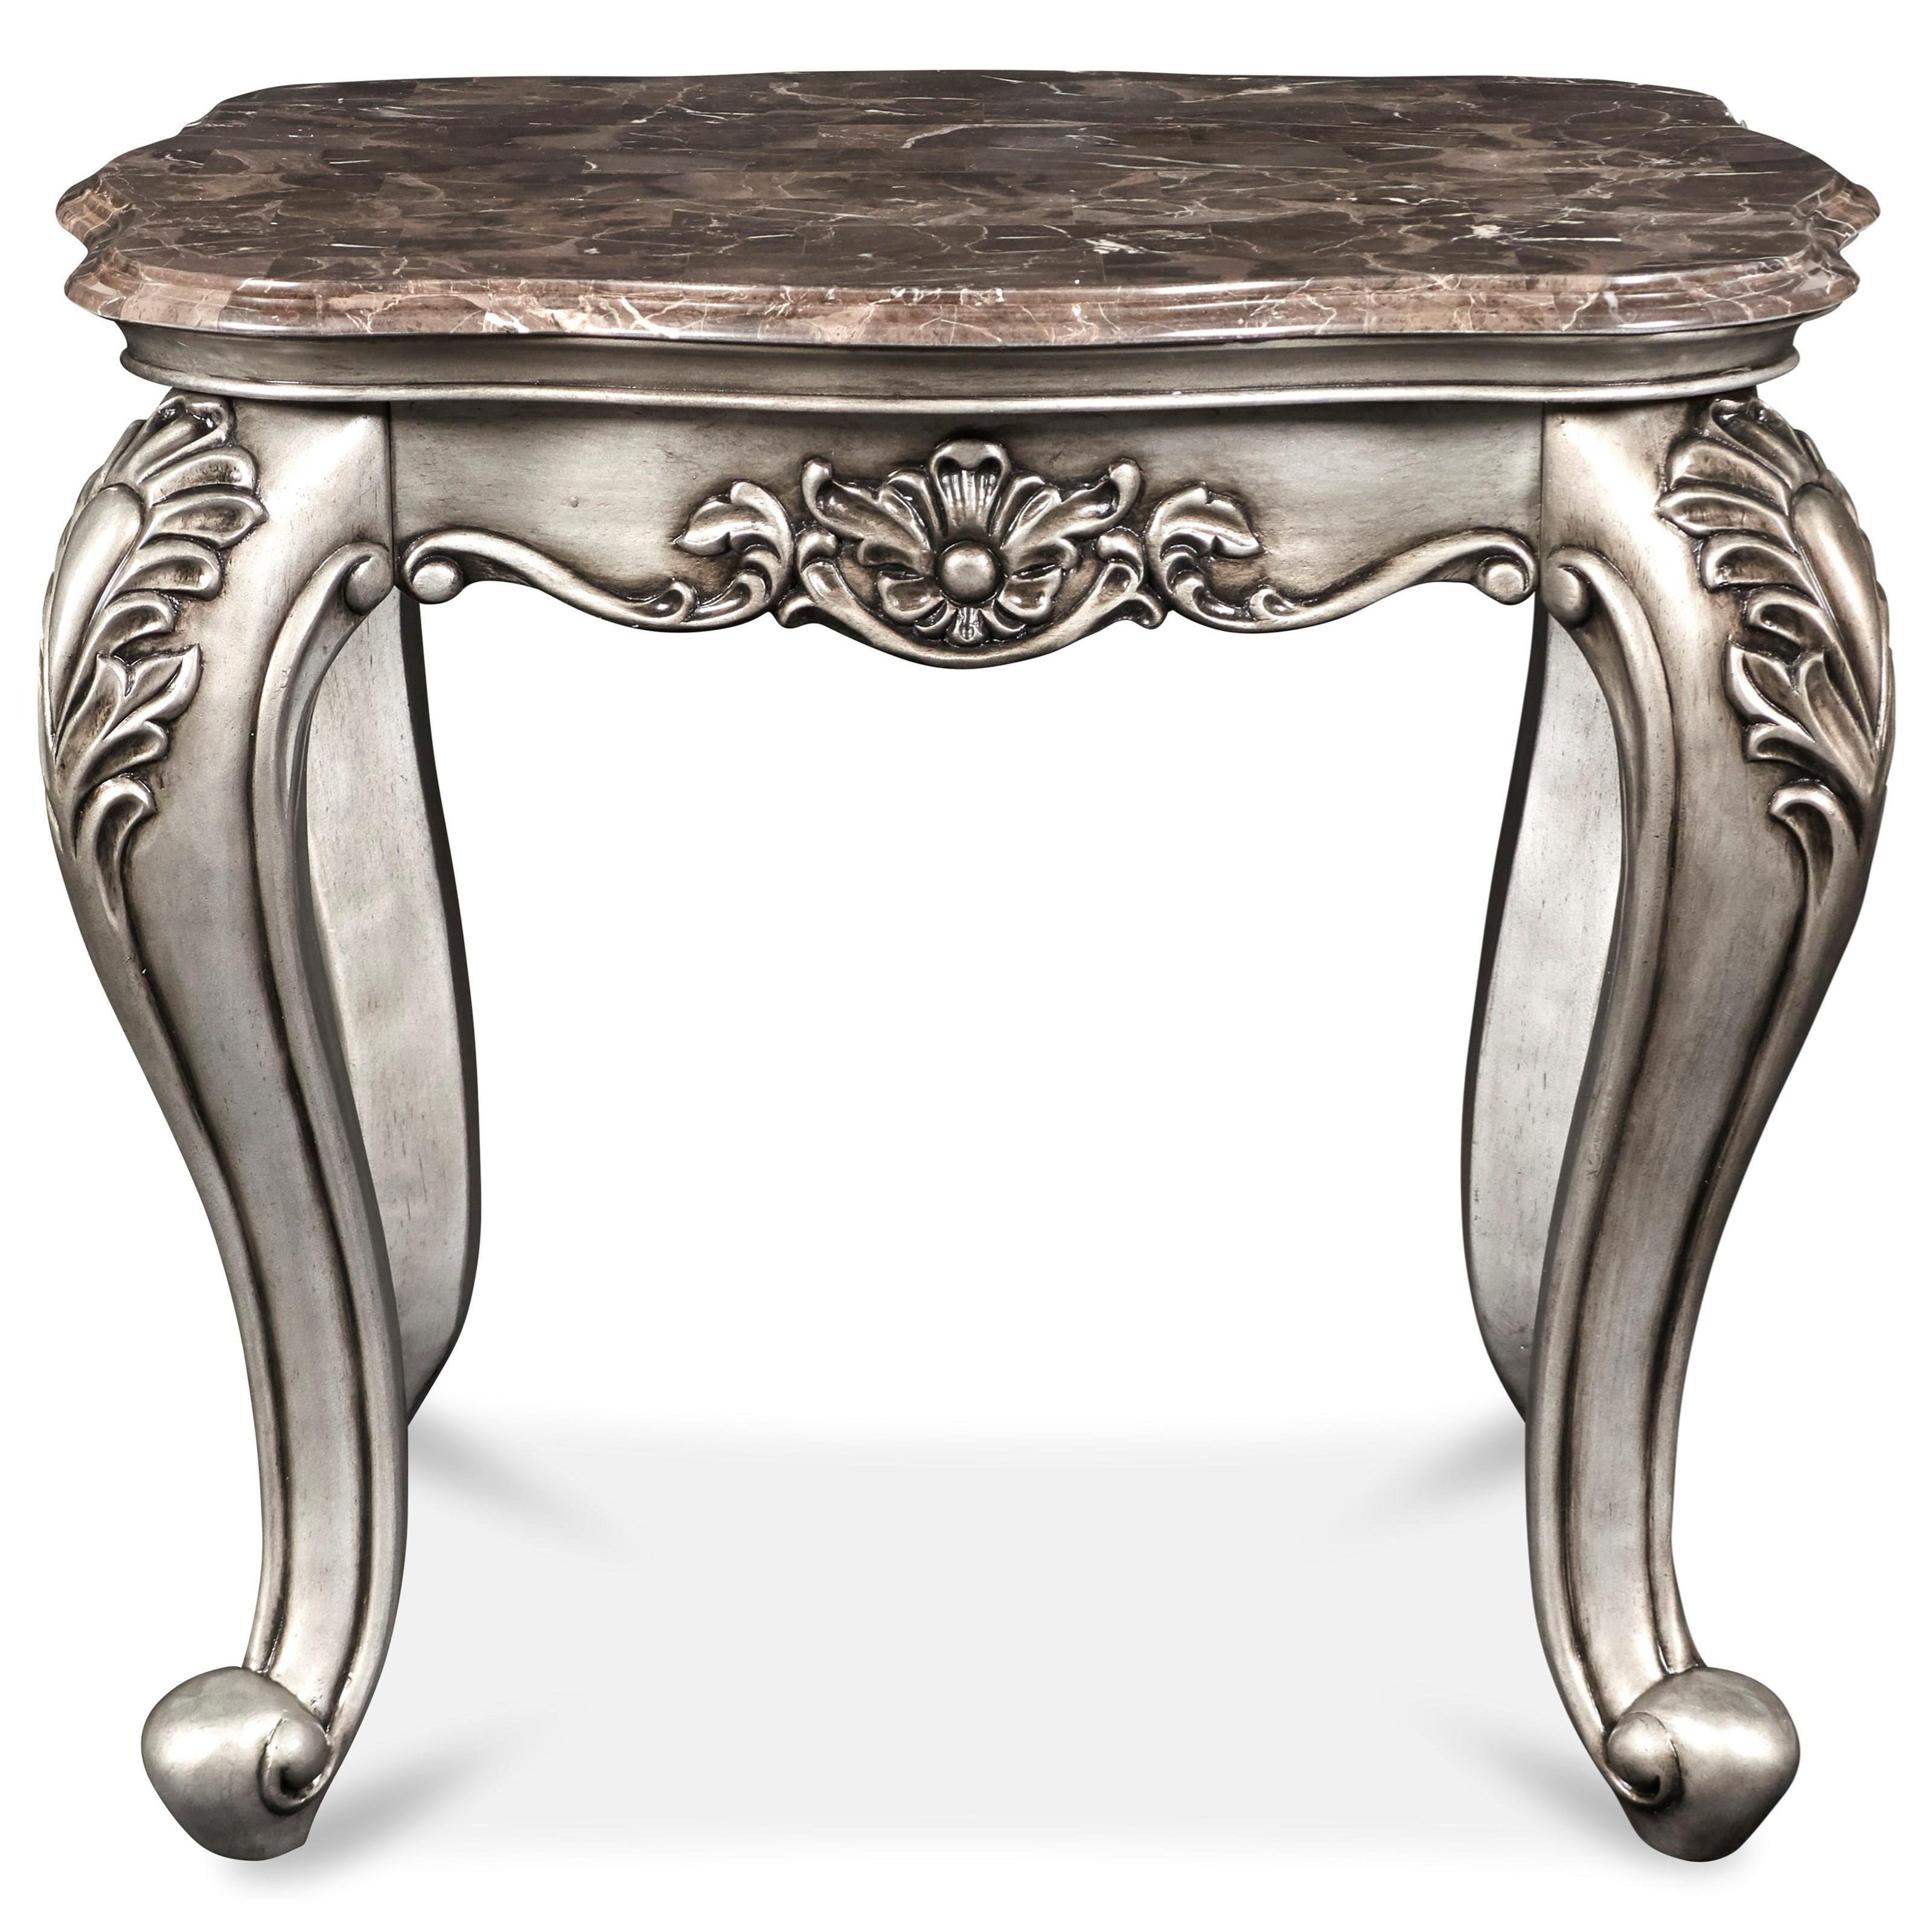 Marguerite End Table at Rotmans